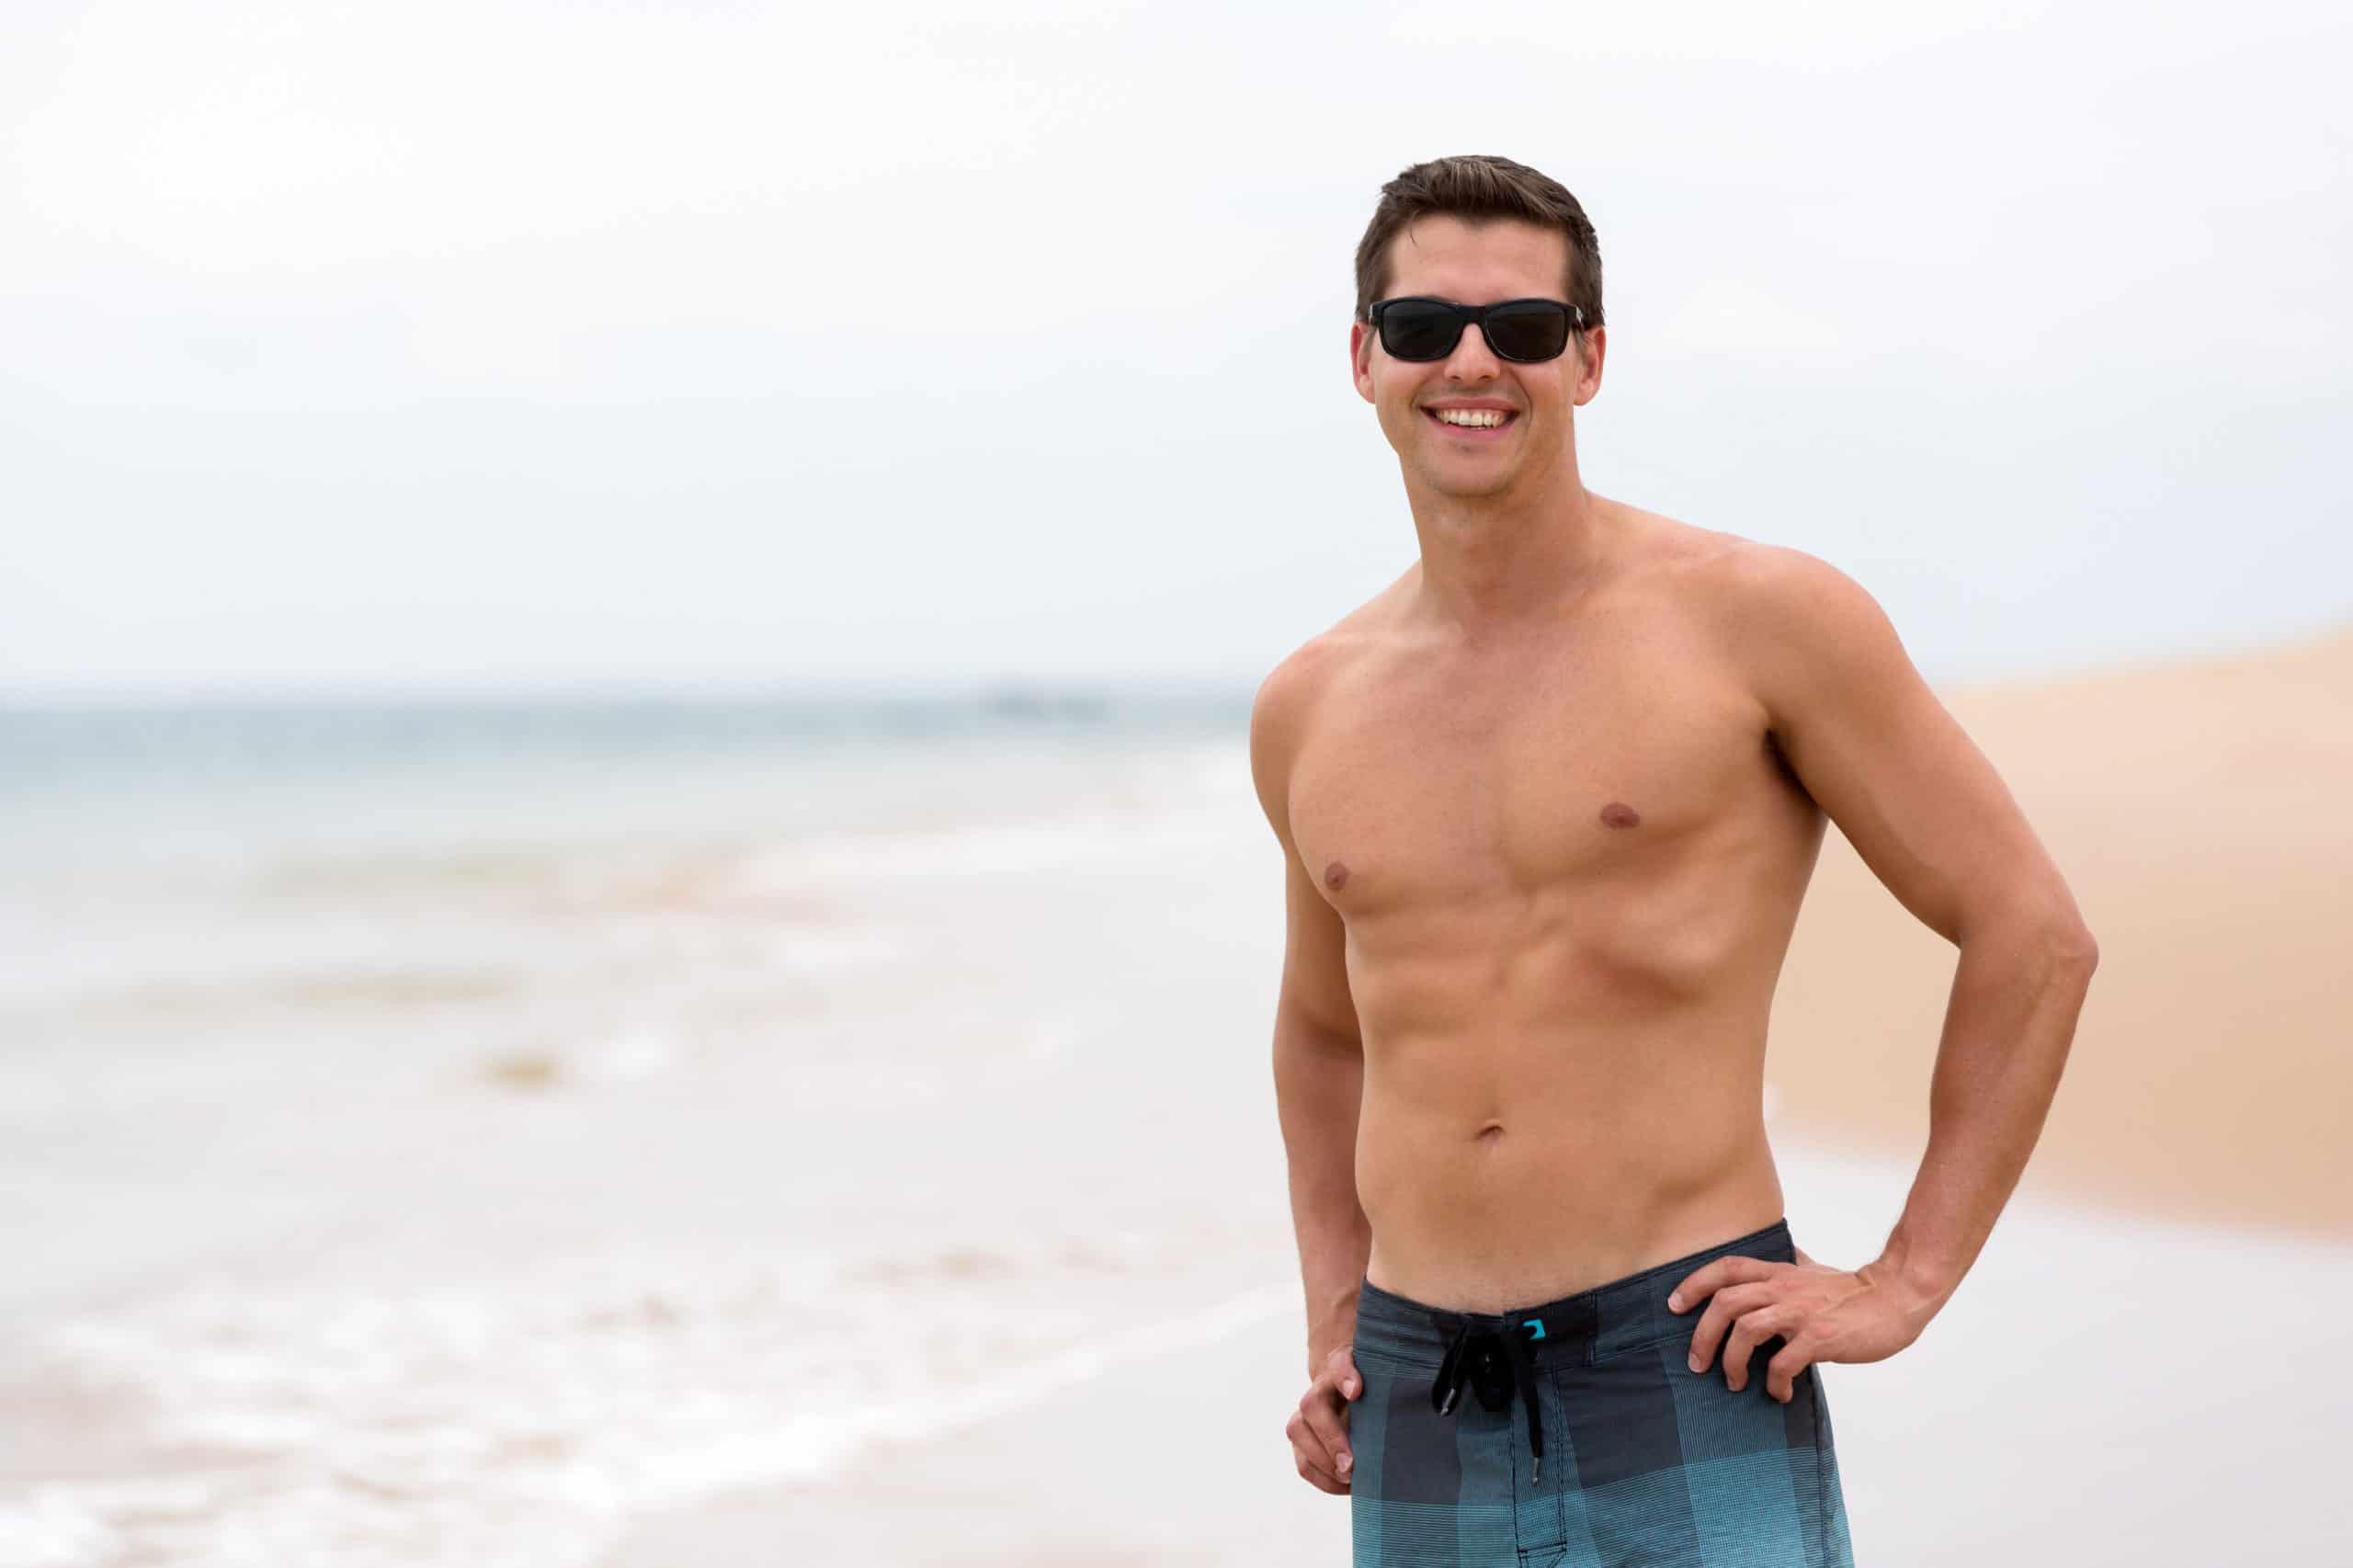 Male breast reduction gynecomastia treatment Montreal